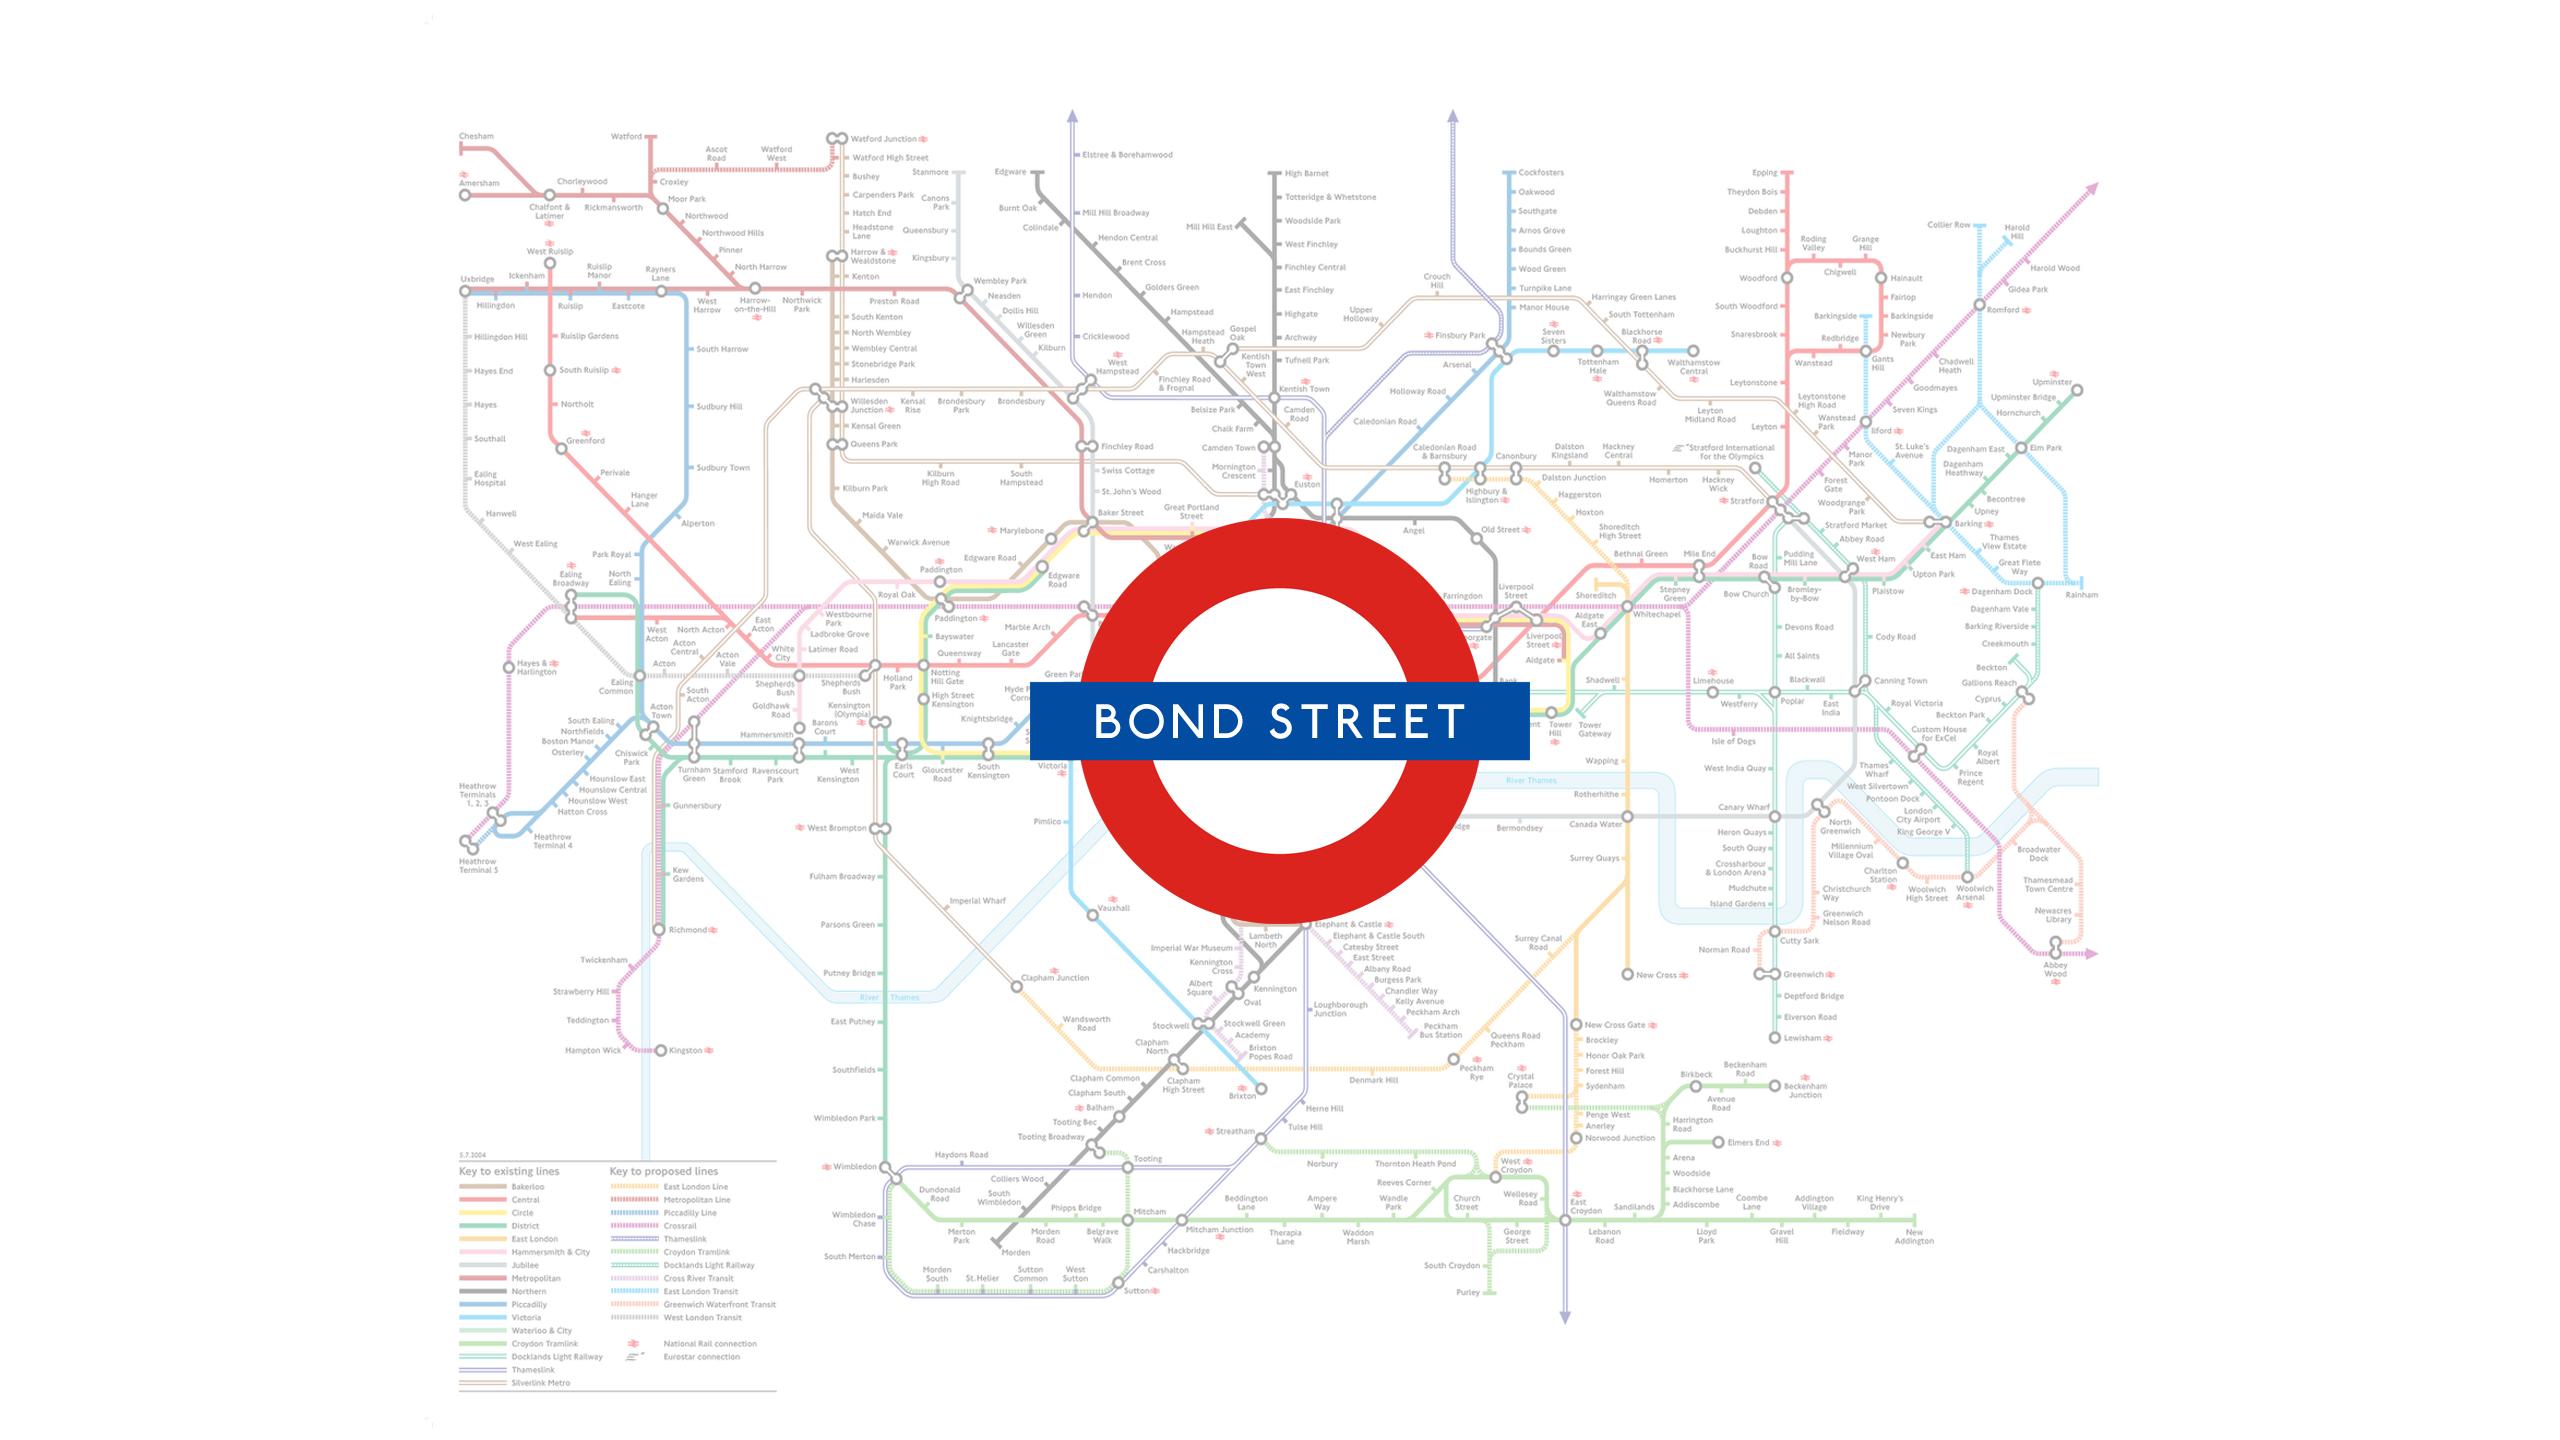 Bond Street (Map)